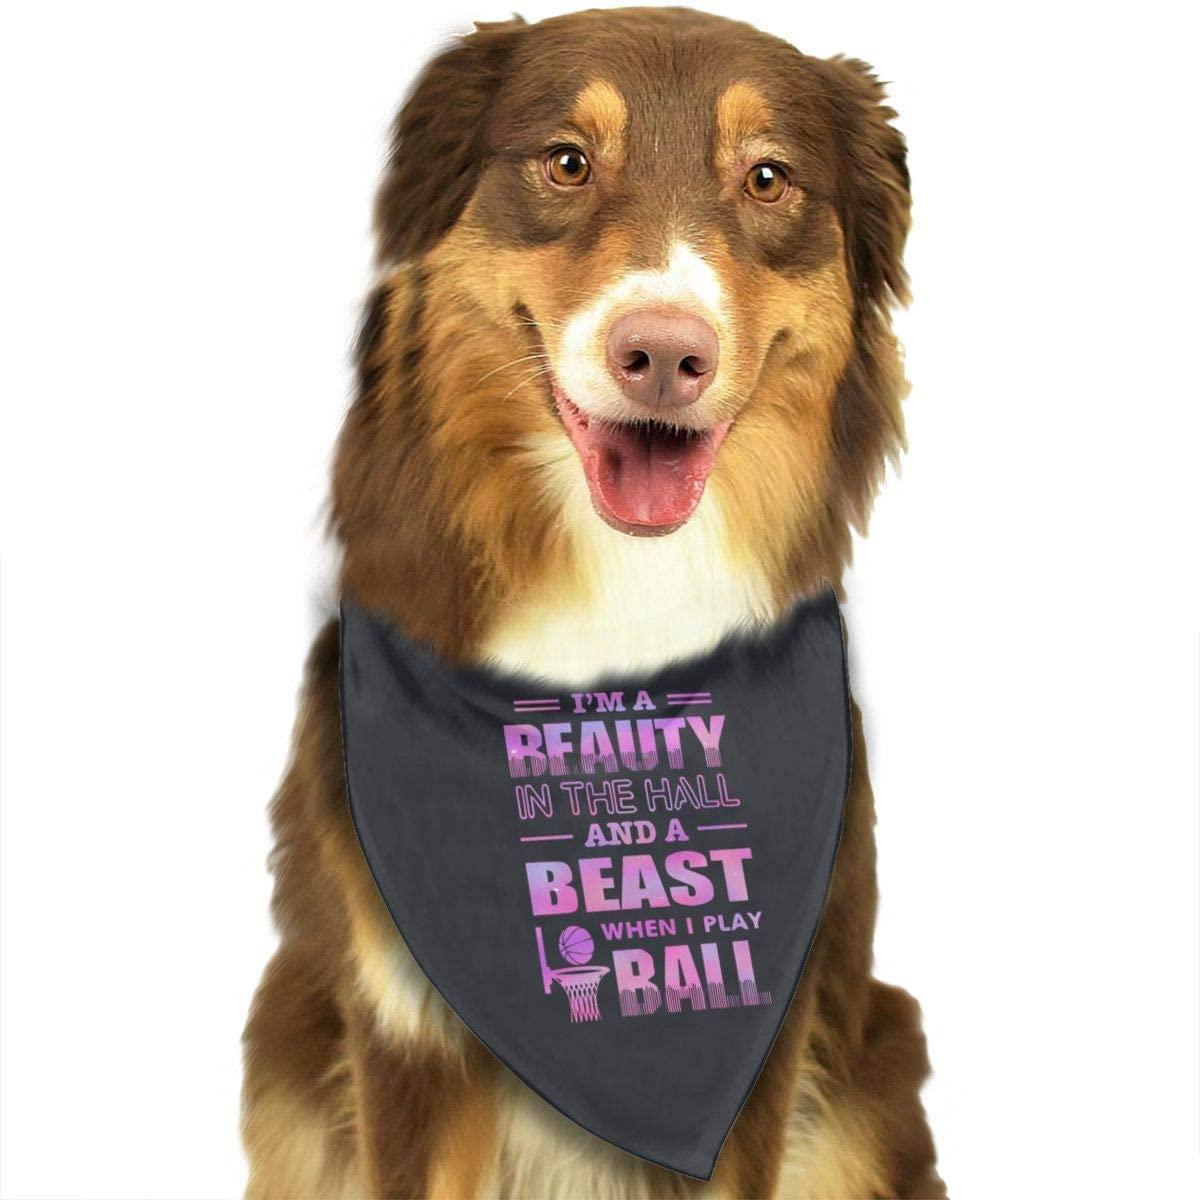 CHAN03 Dogs Bandana Collars Basketball Girls Beauty Pets Triangle Neckerchief Puppy Bibs Scarfs Cats Scarfs Towel